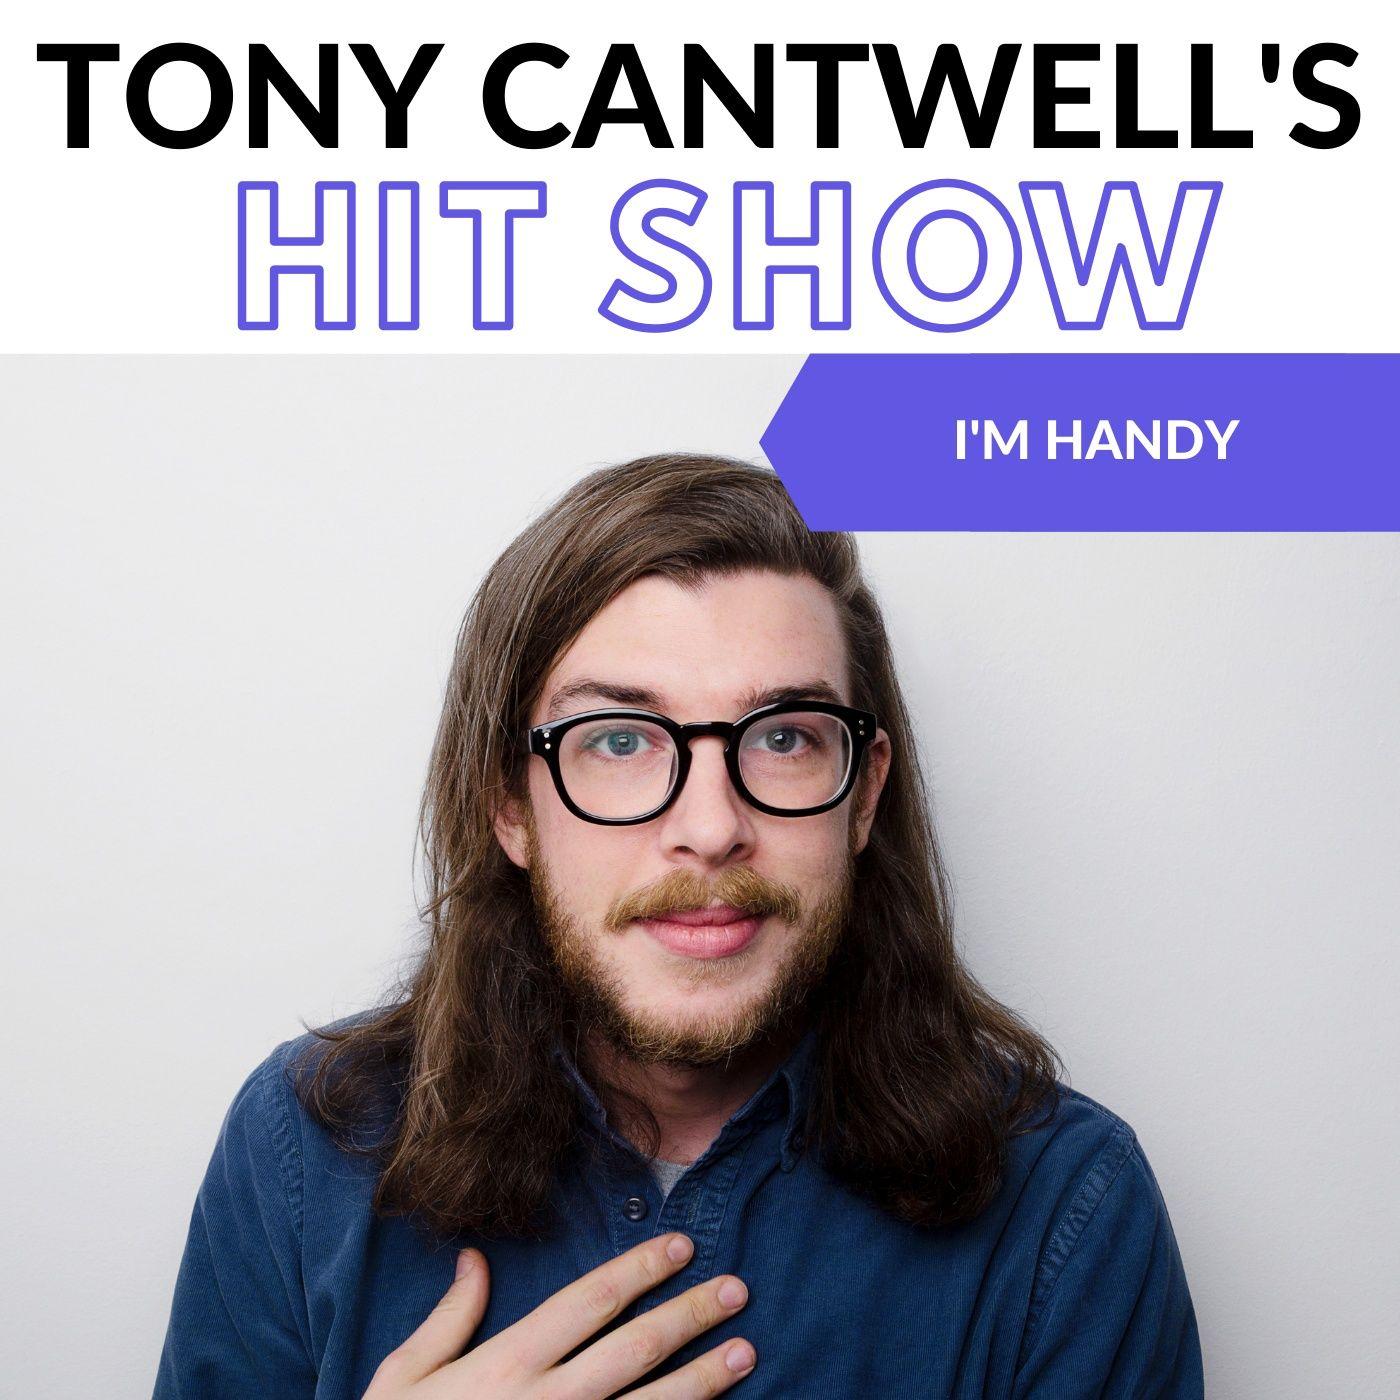 Episode 86 - I'm Handy